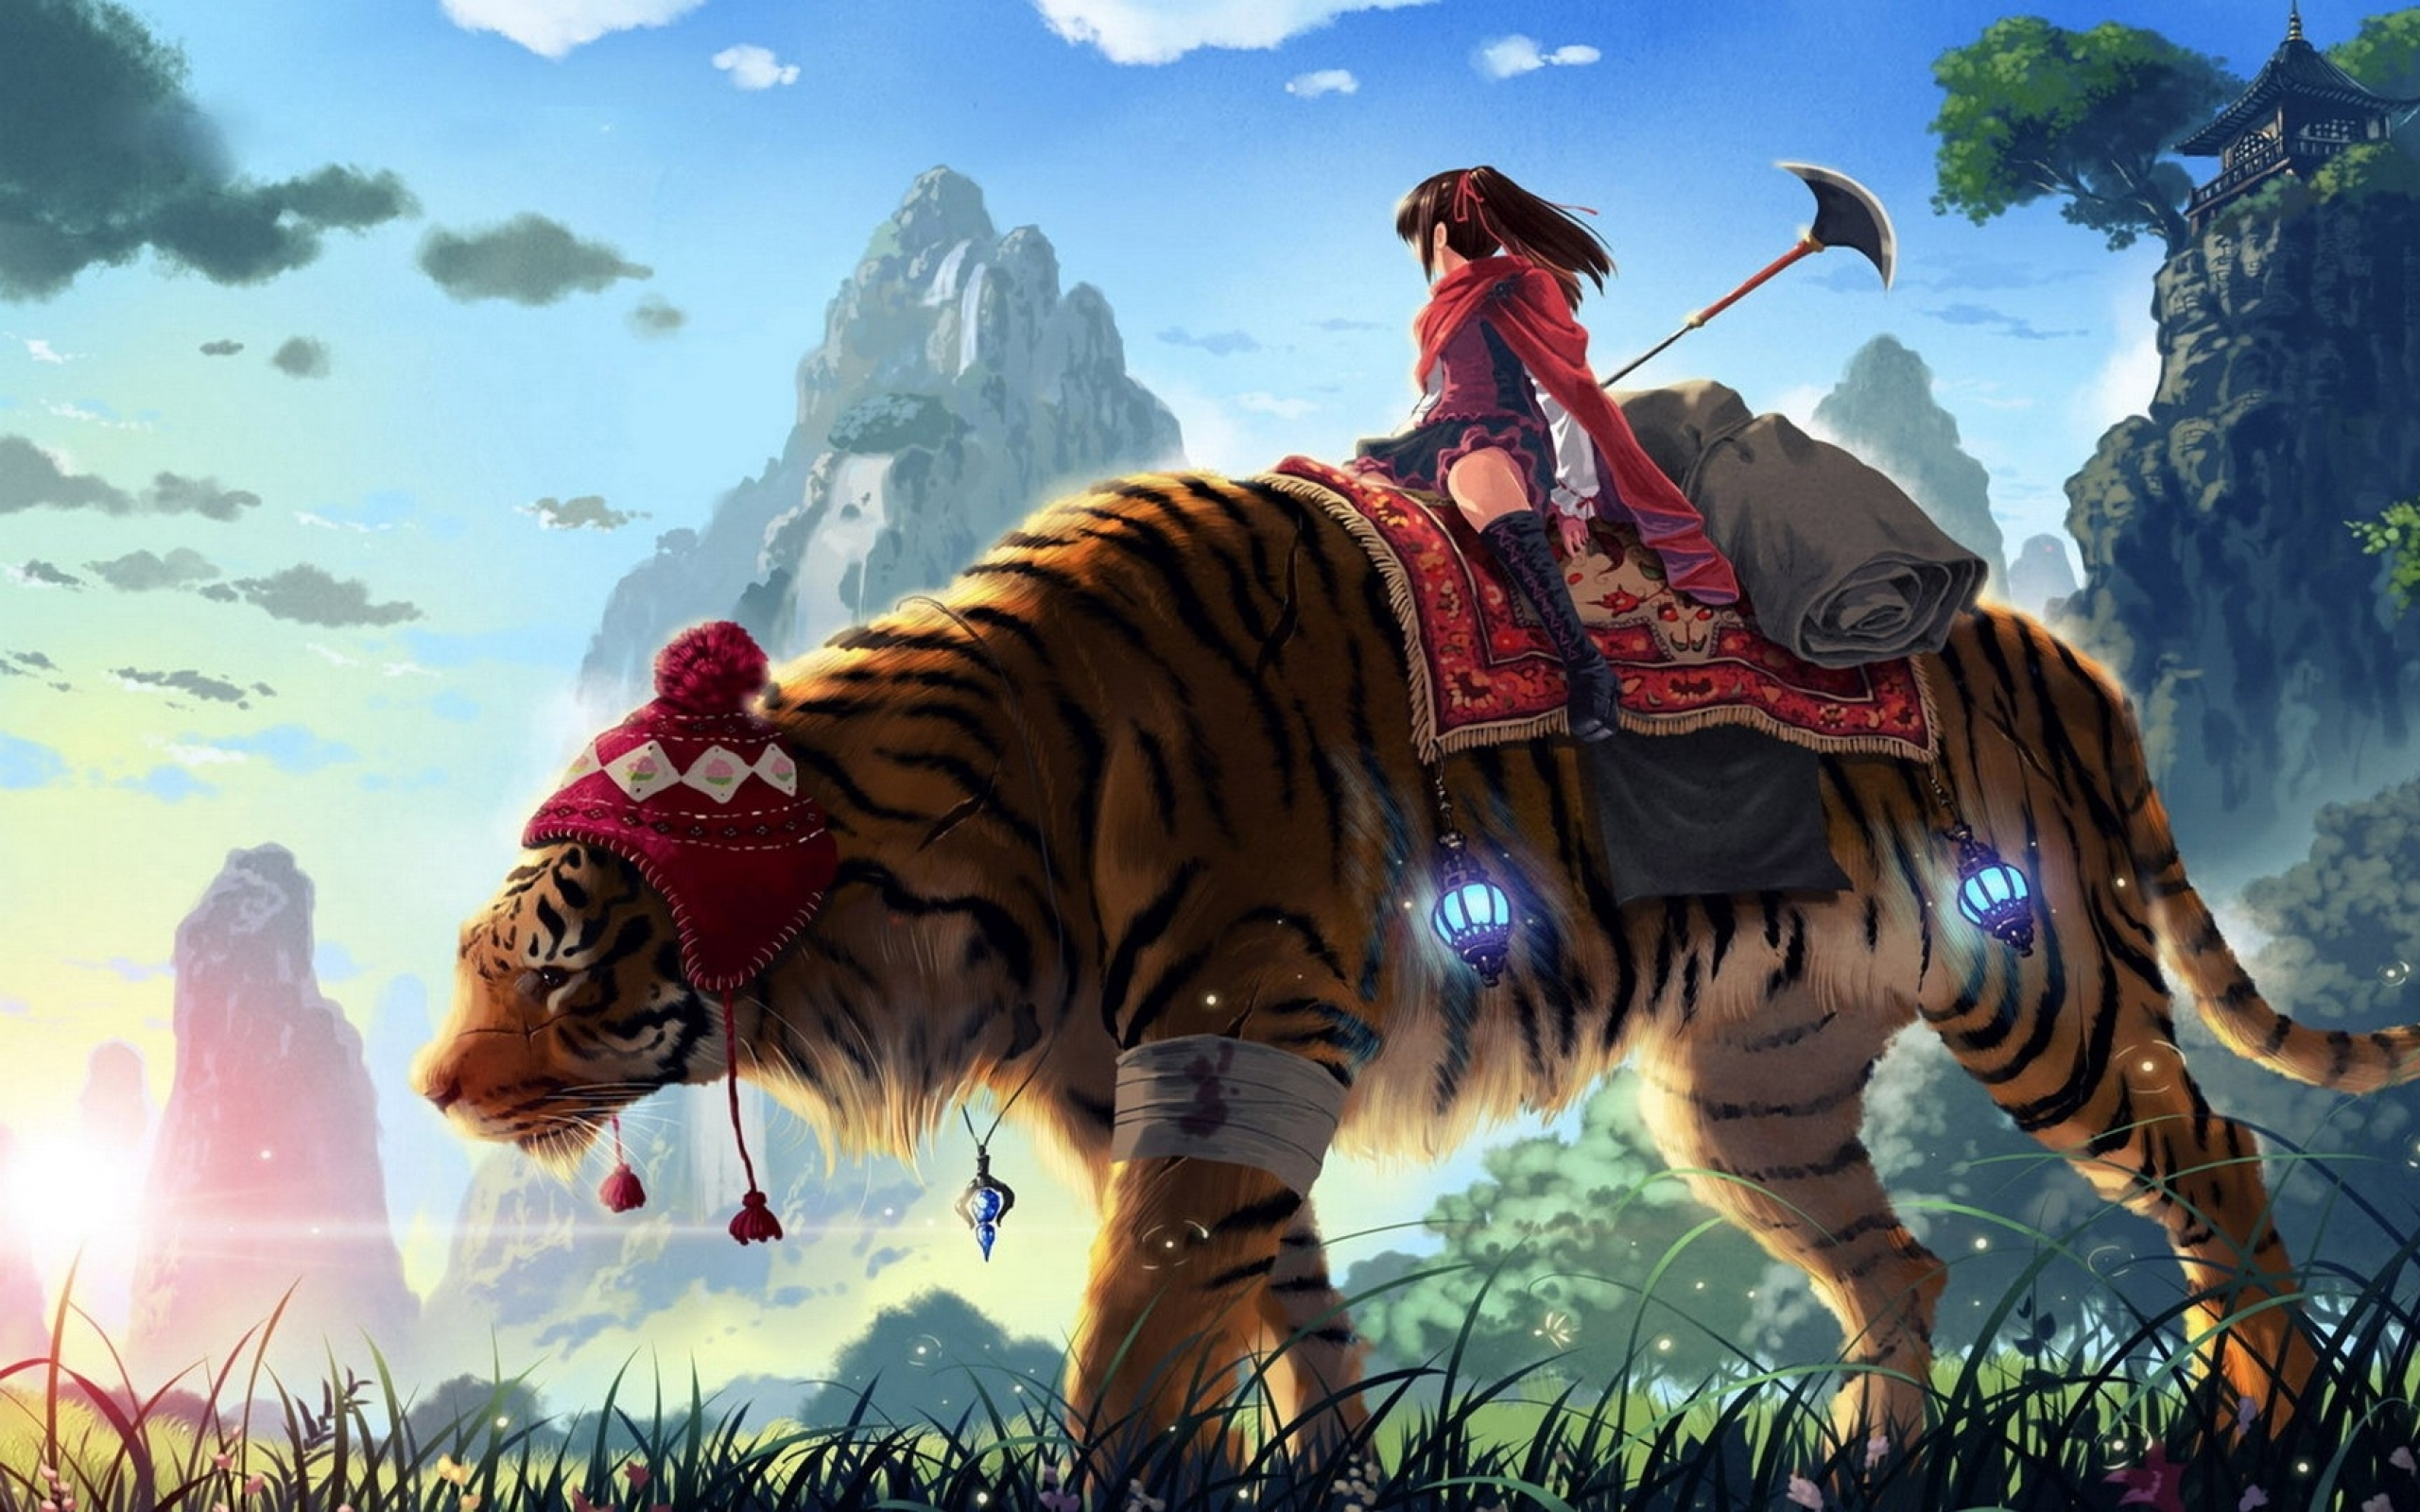 Epic Anime Art Character Wallpaper HD Desktop 1646 Wallpaper 2560x1600